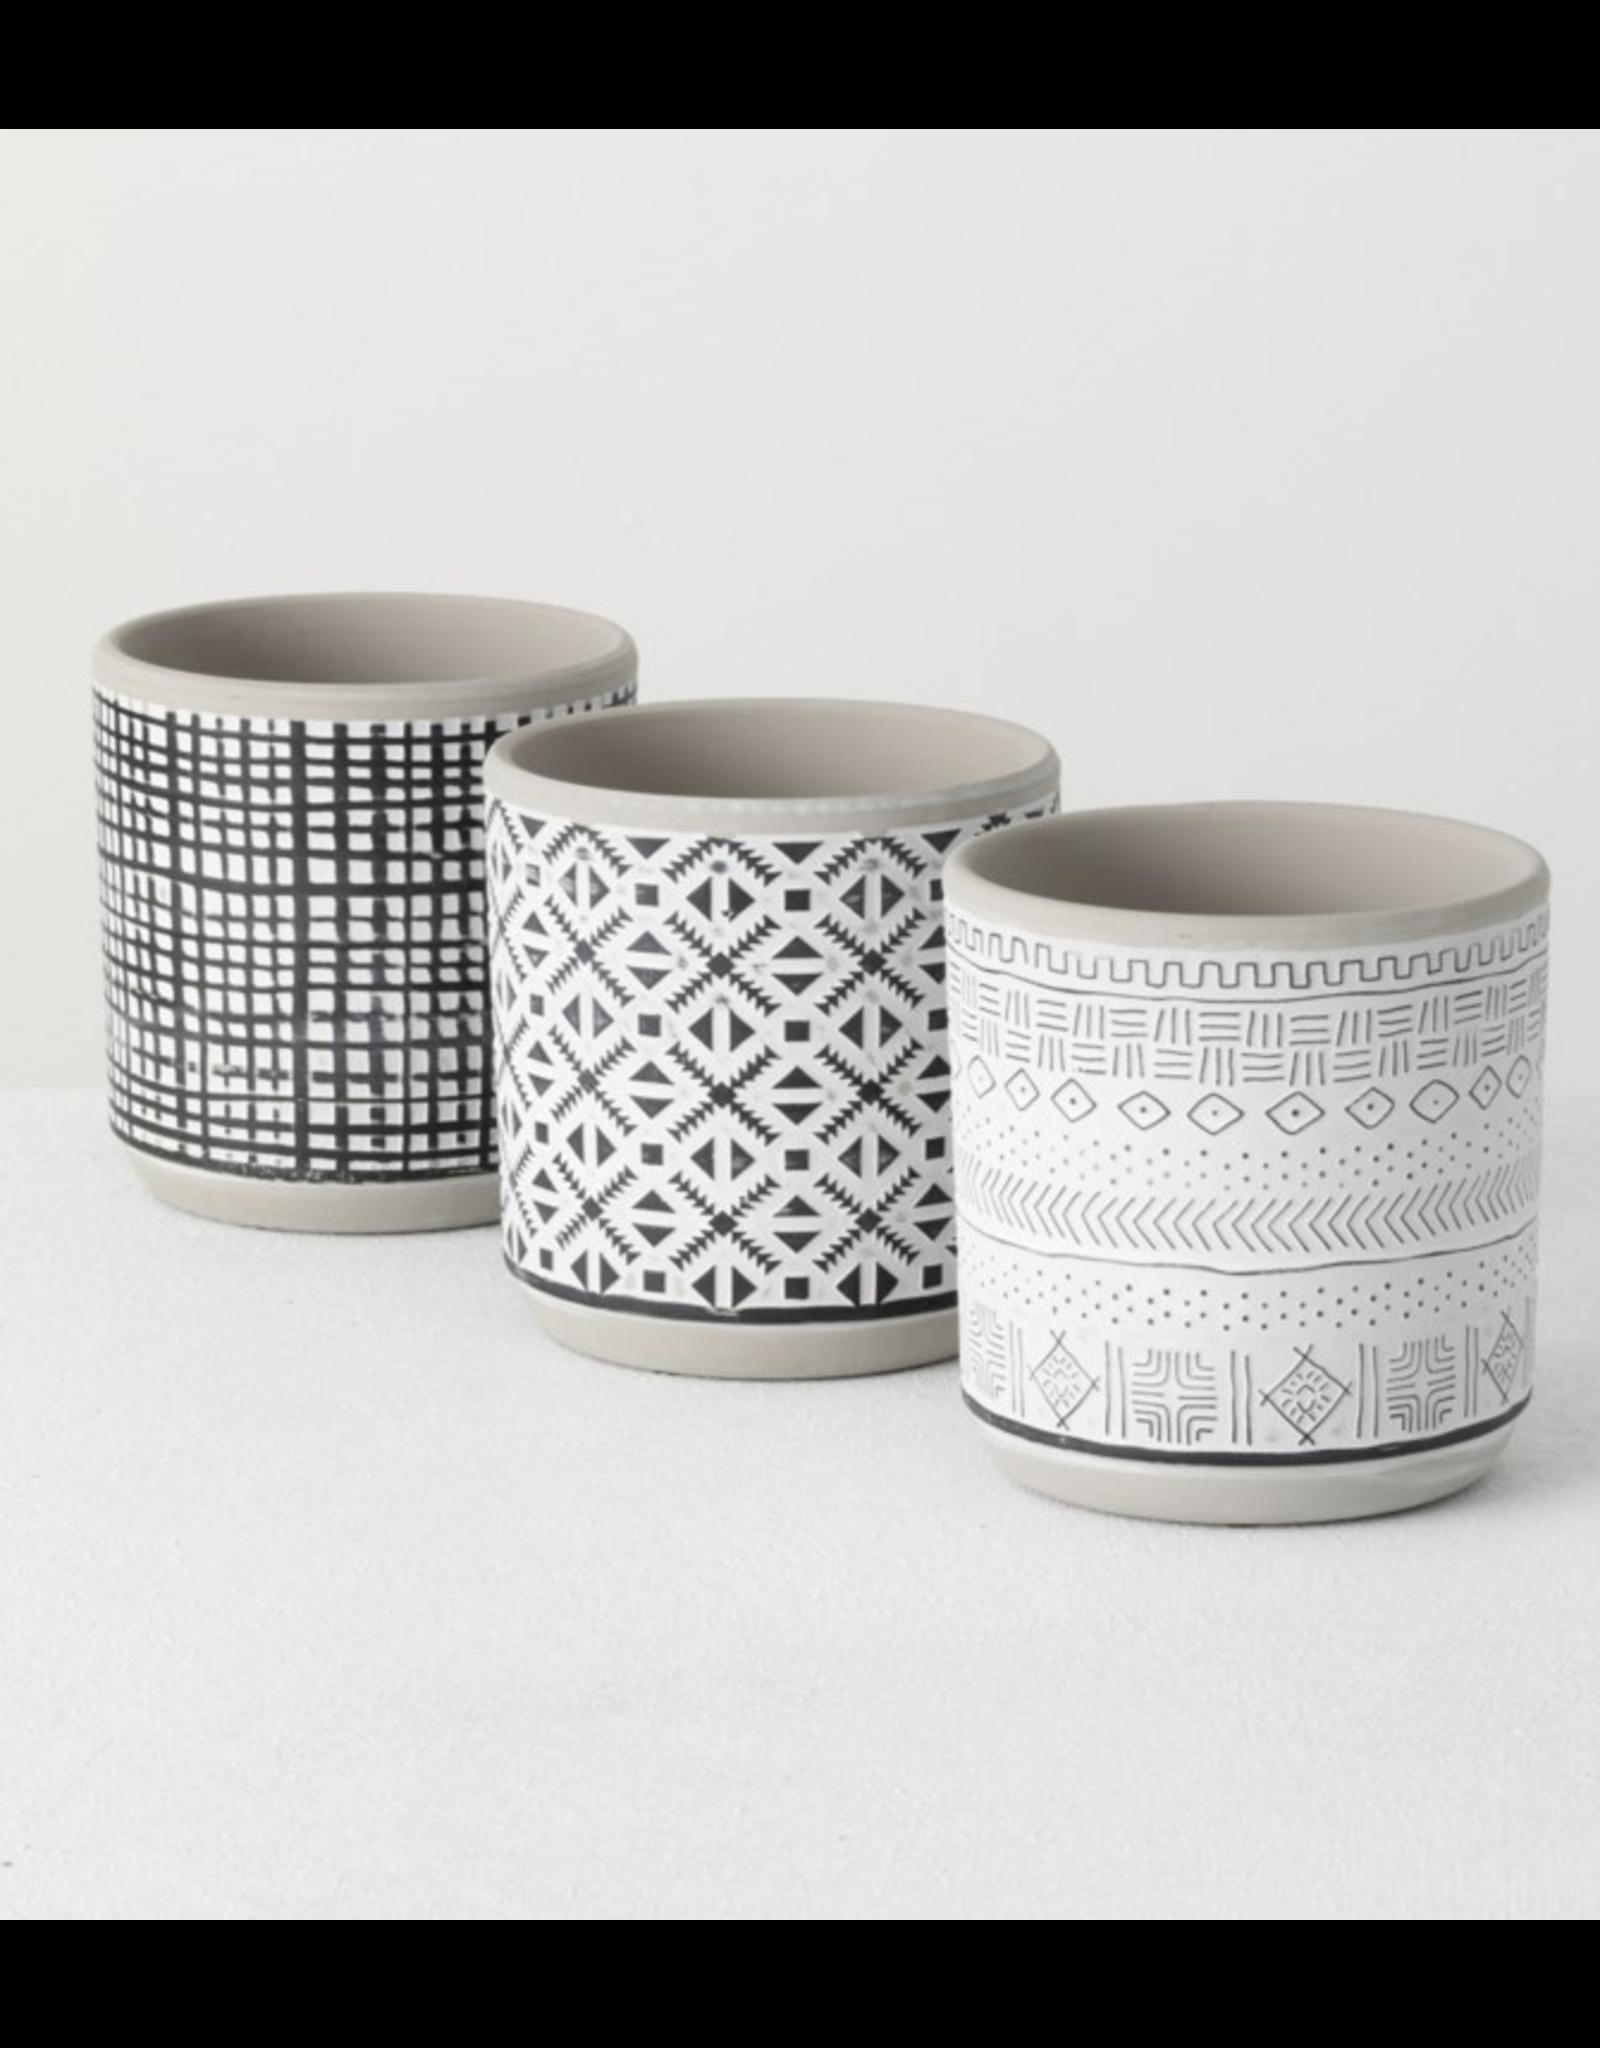 Sullivan's Ceramic Planter Pot with Relief Pattern